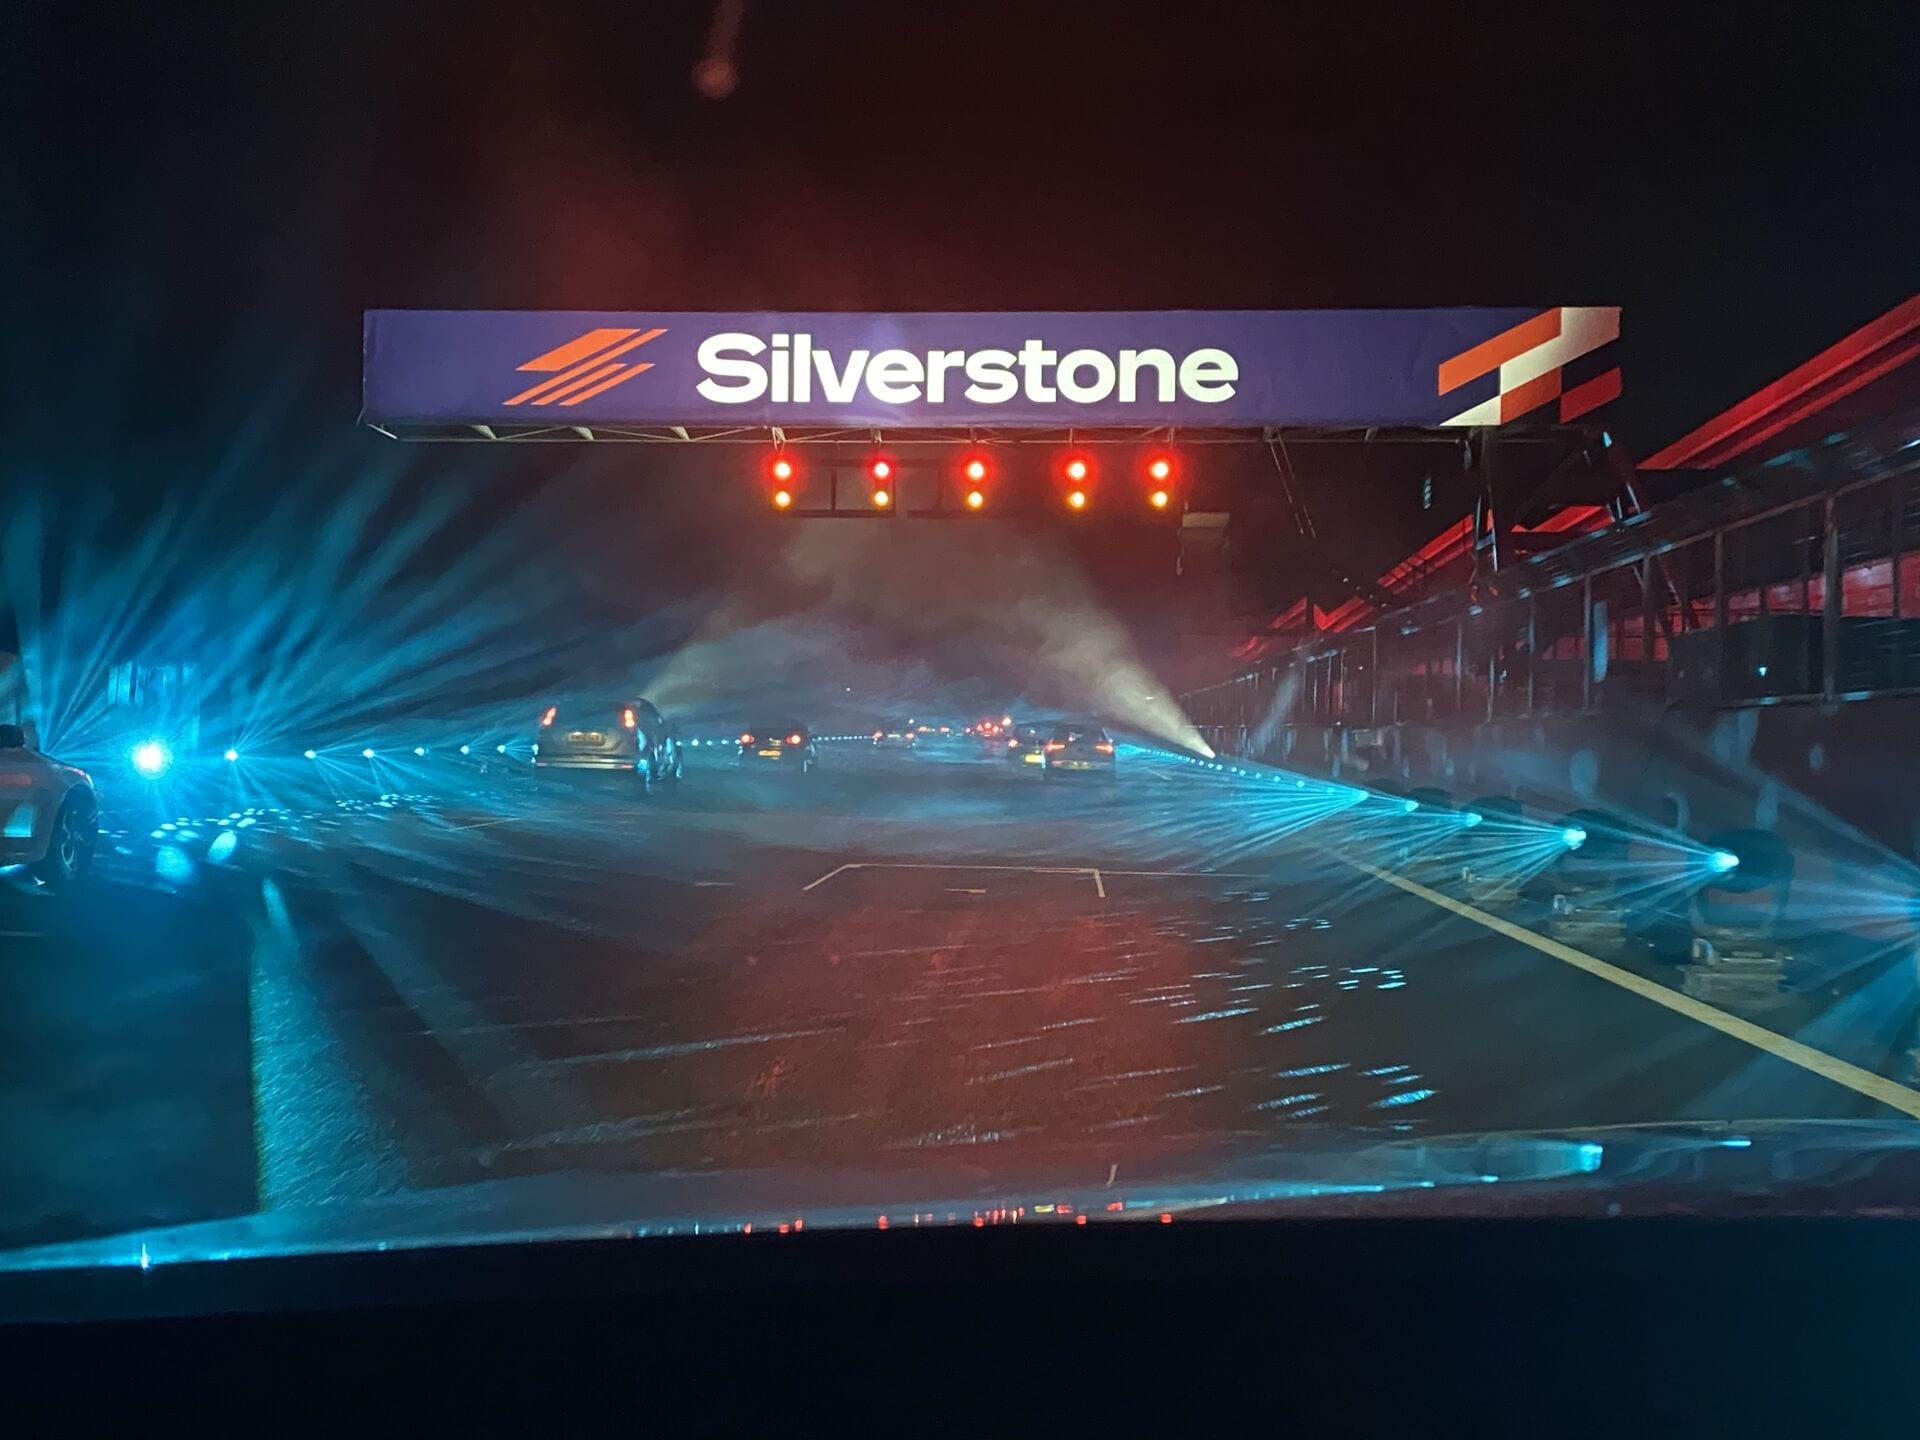 Hamilton Straight Lapland Silverstone